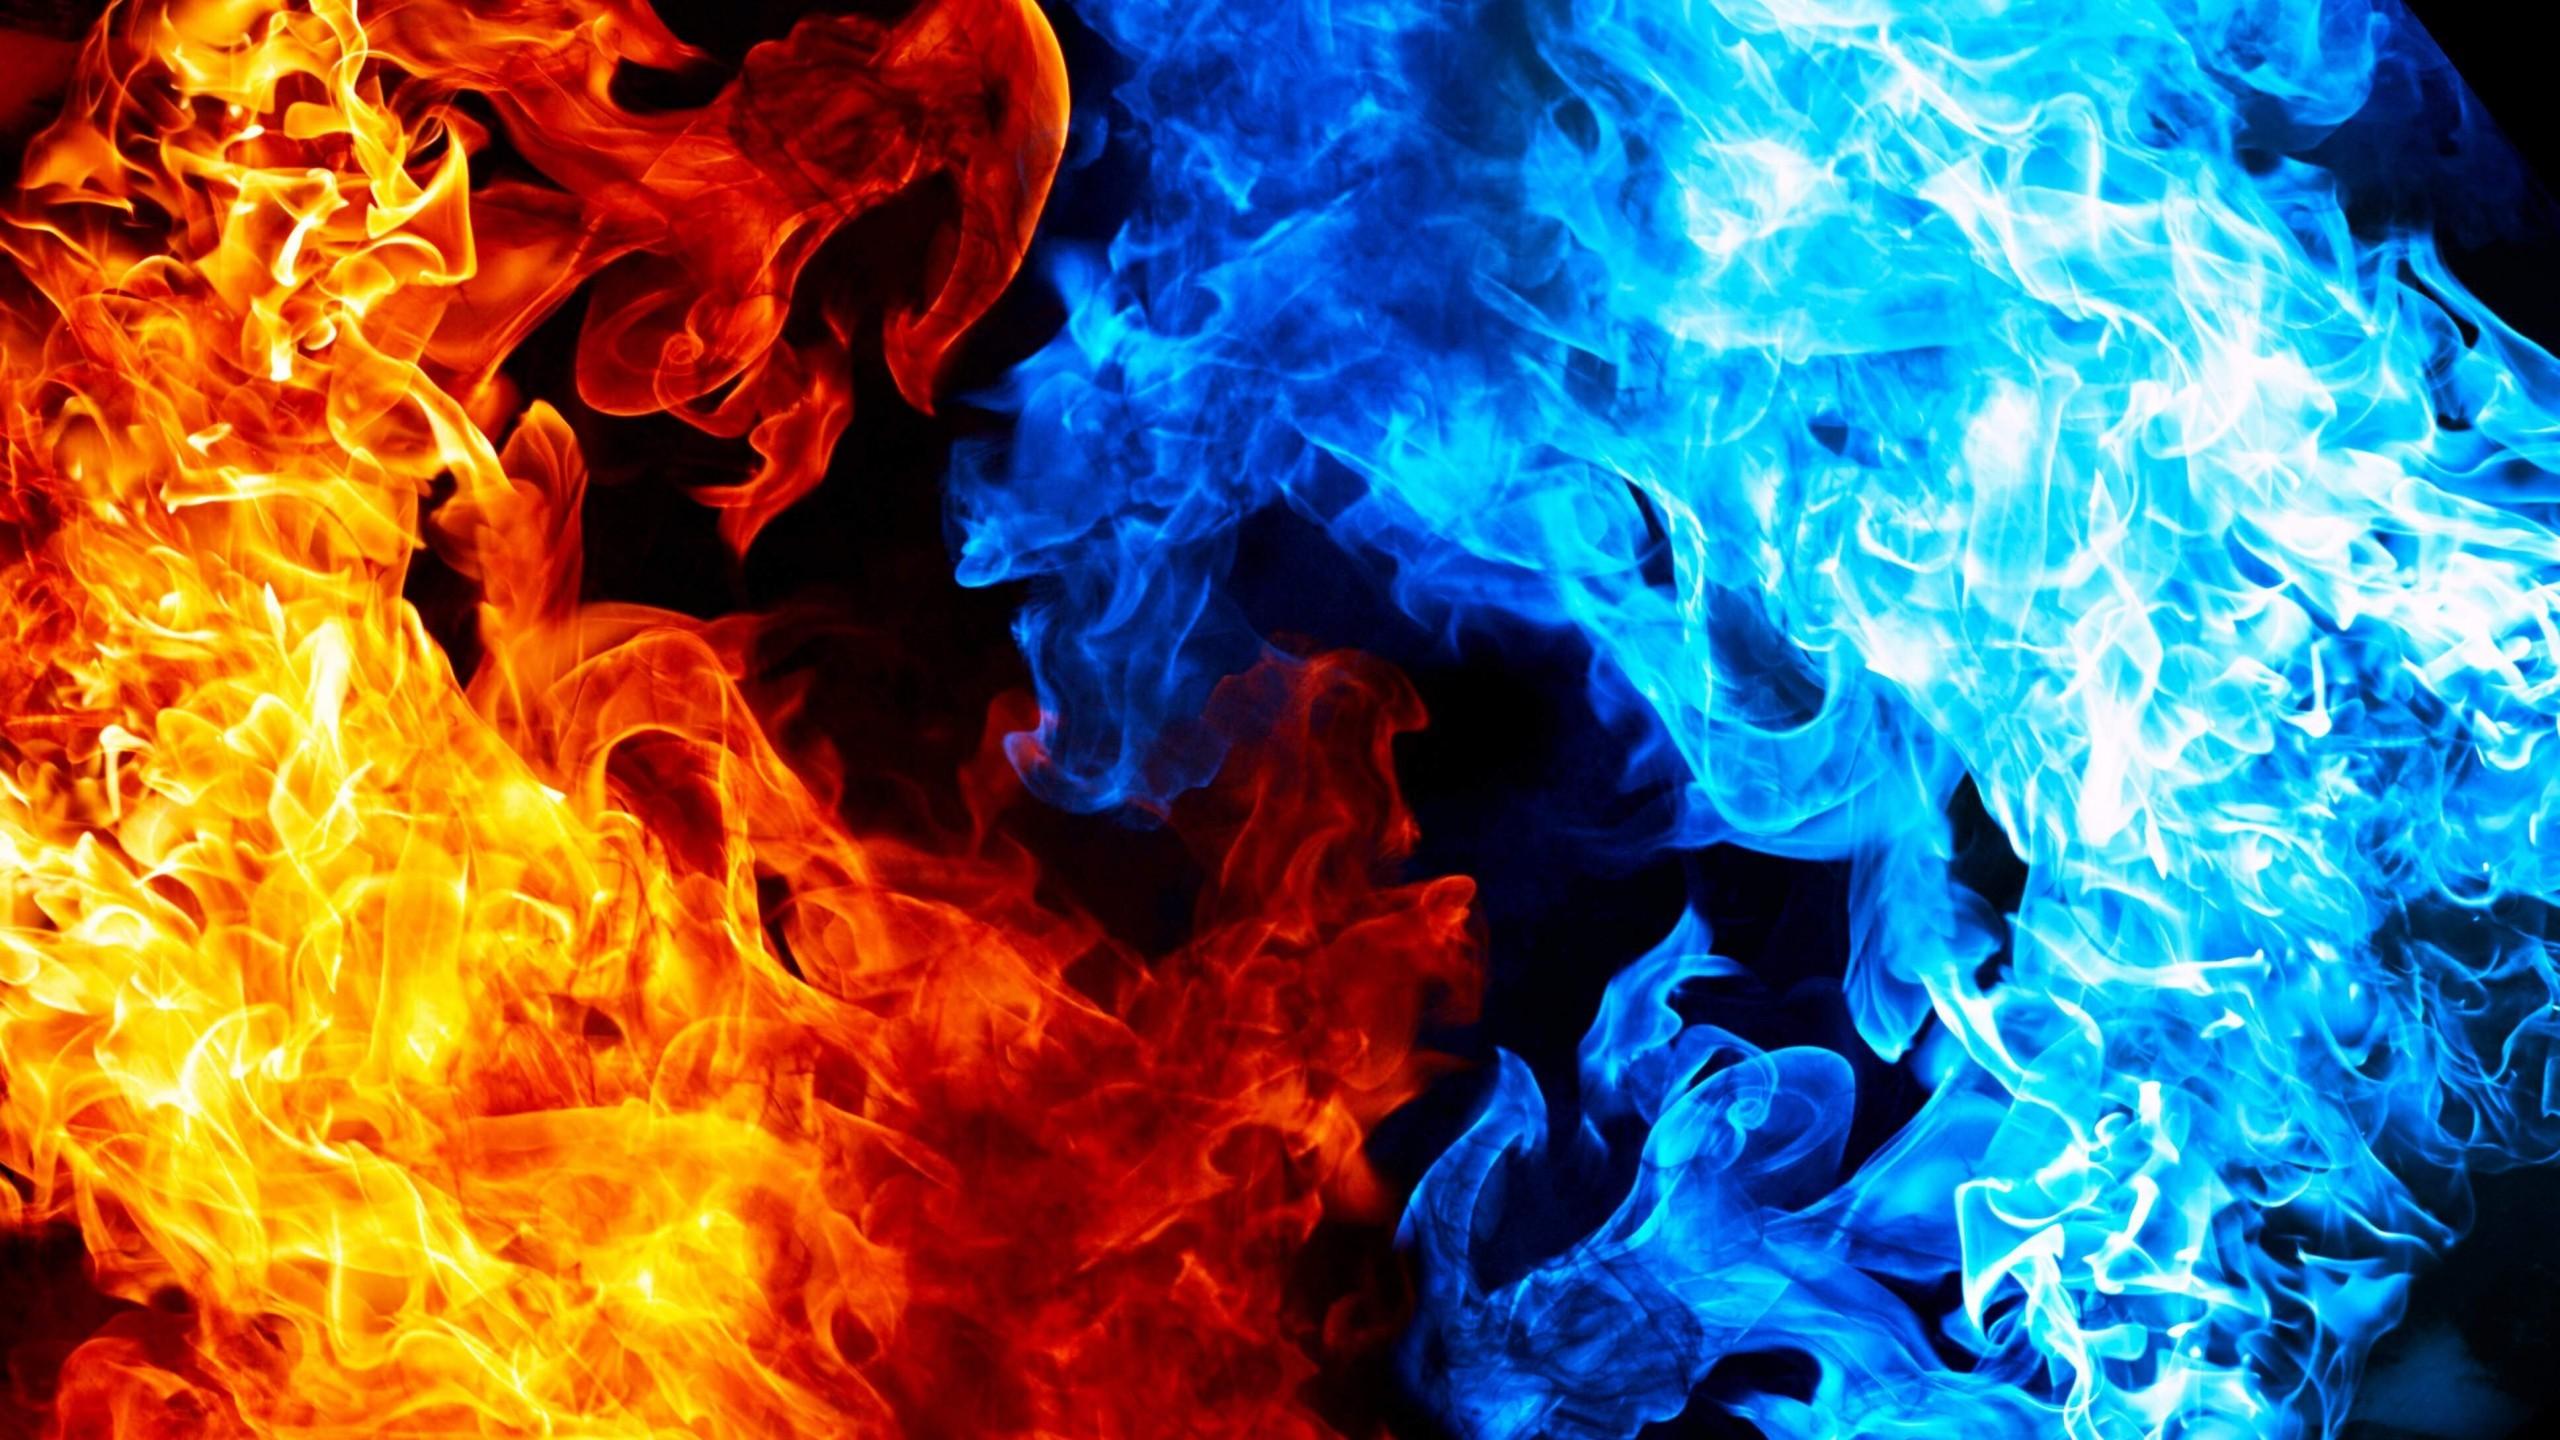 Blue Fire Wallpaper Hd 70 Images